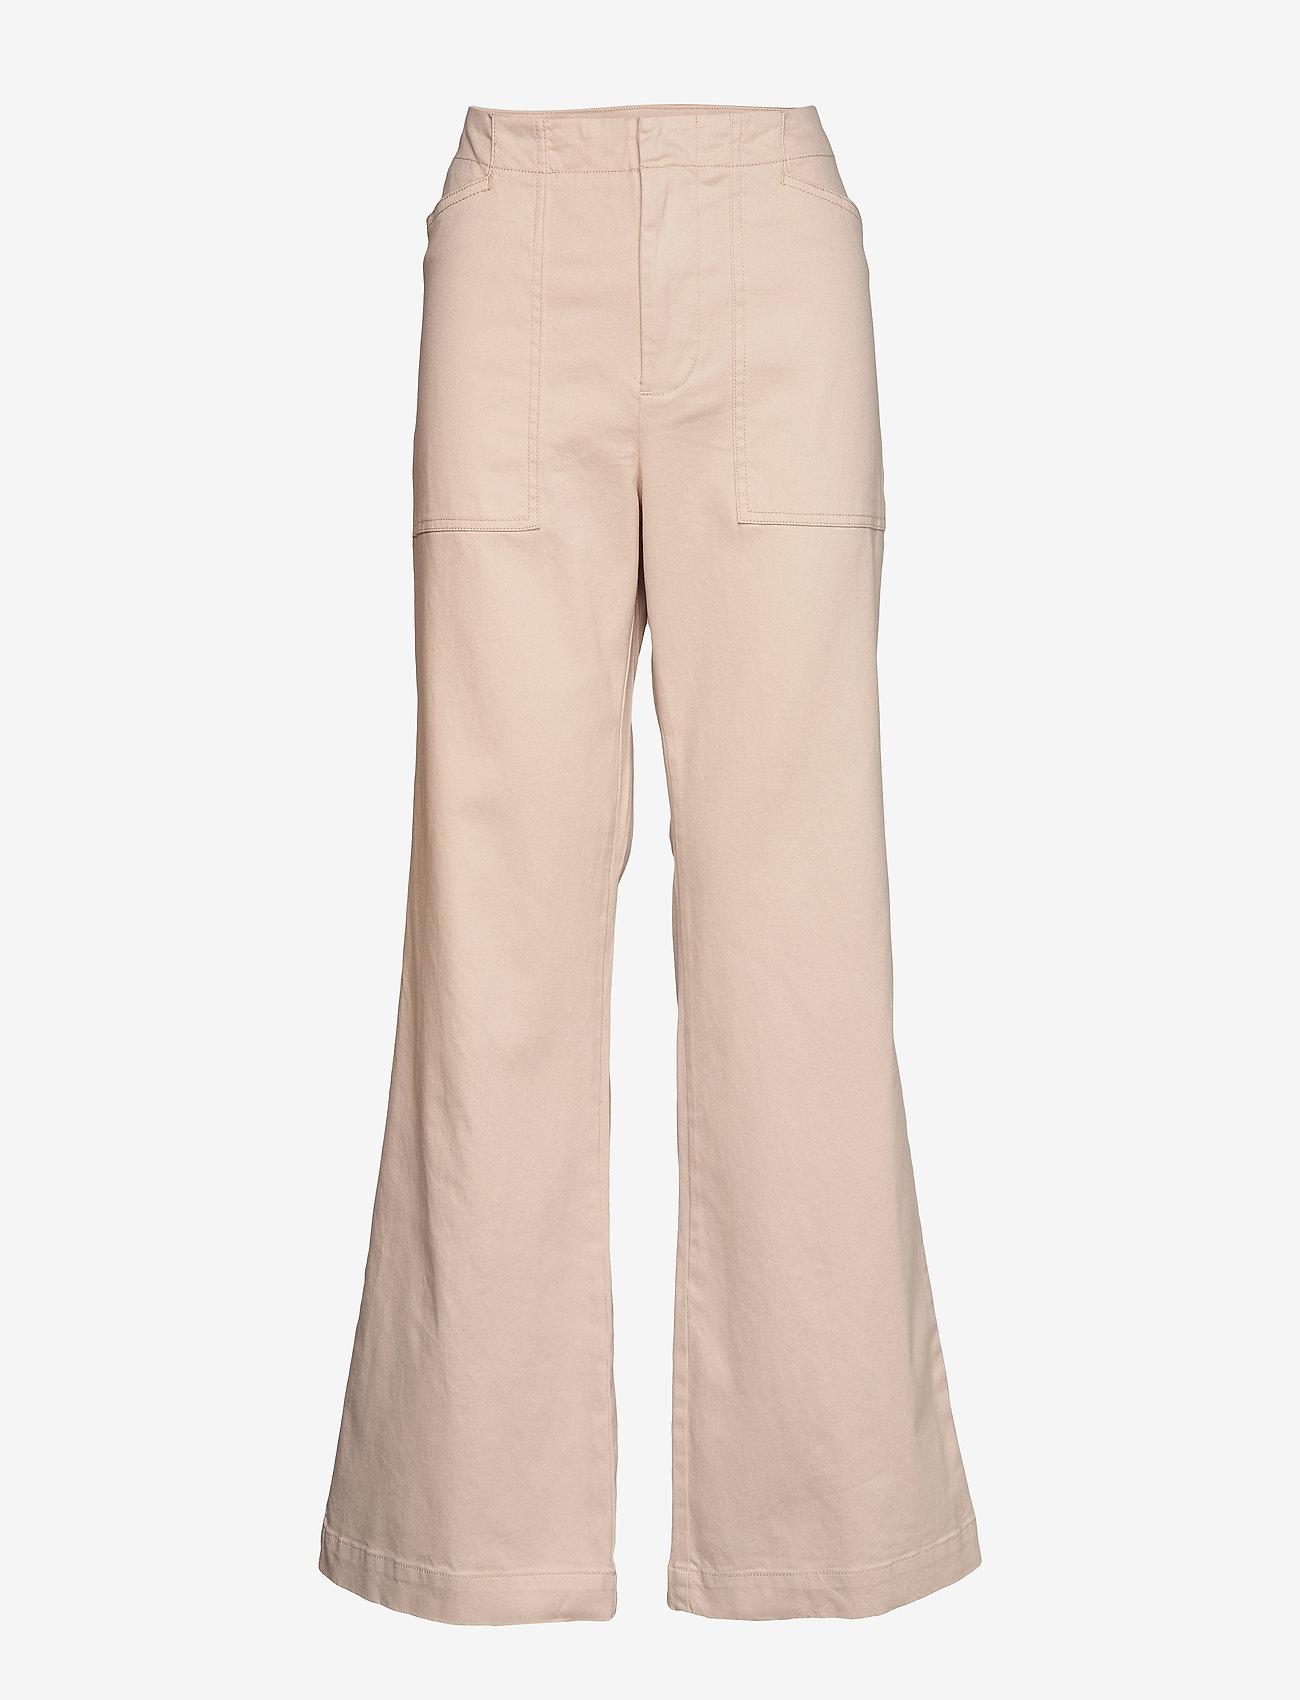 InWear MavisIW Pants - Bukser FRENCH NOUGAT - Dameklær Spesialtilbud